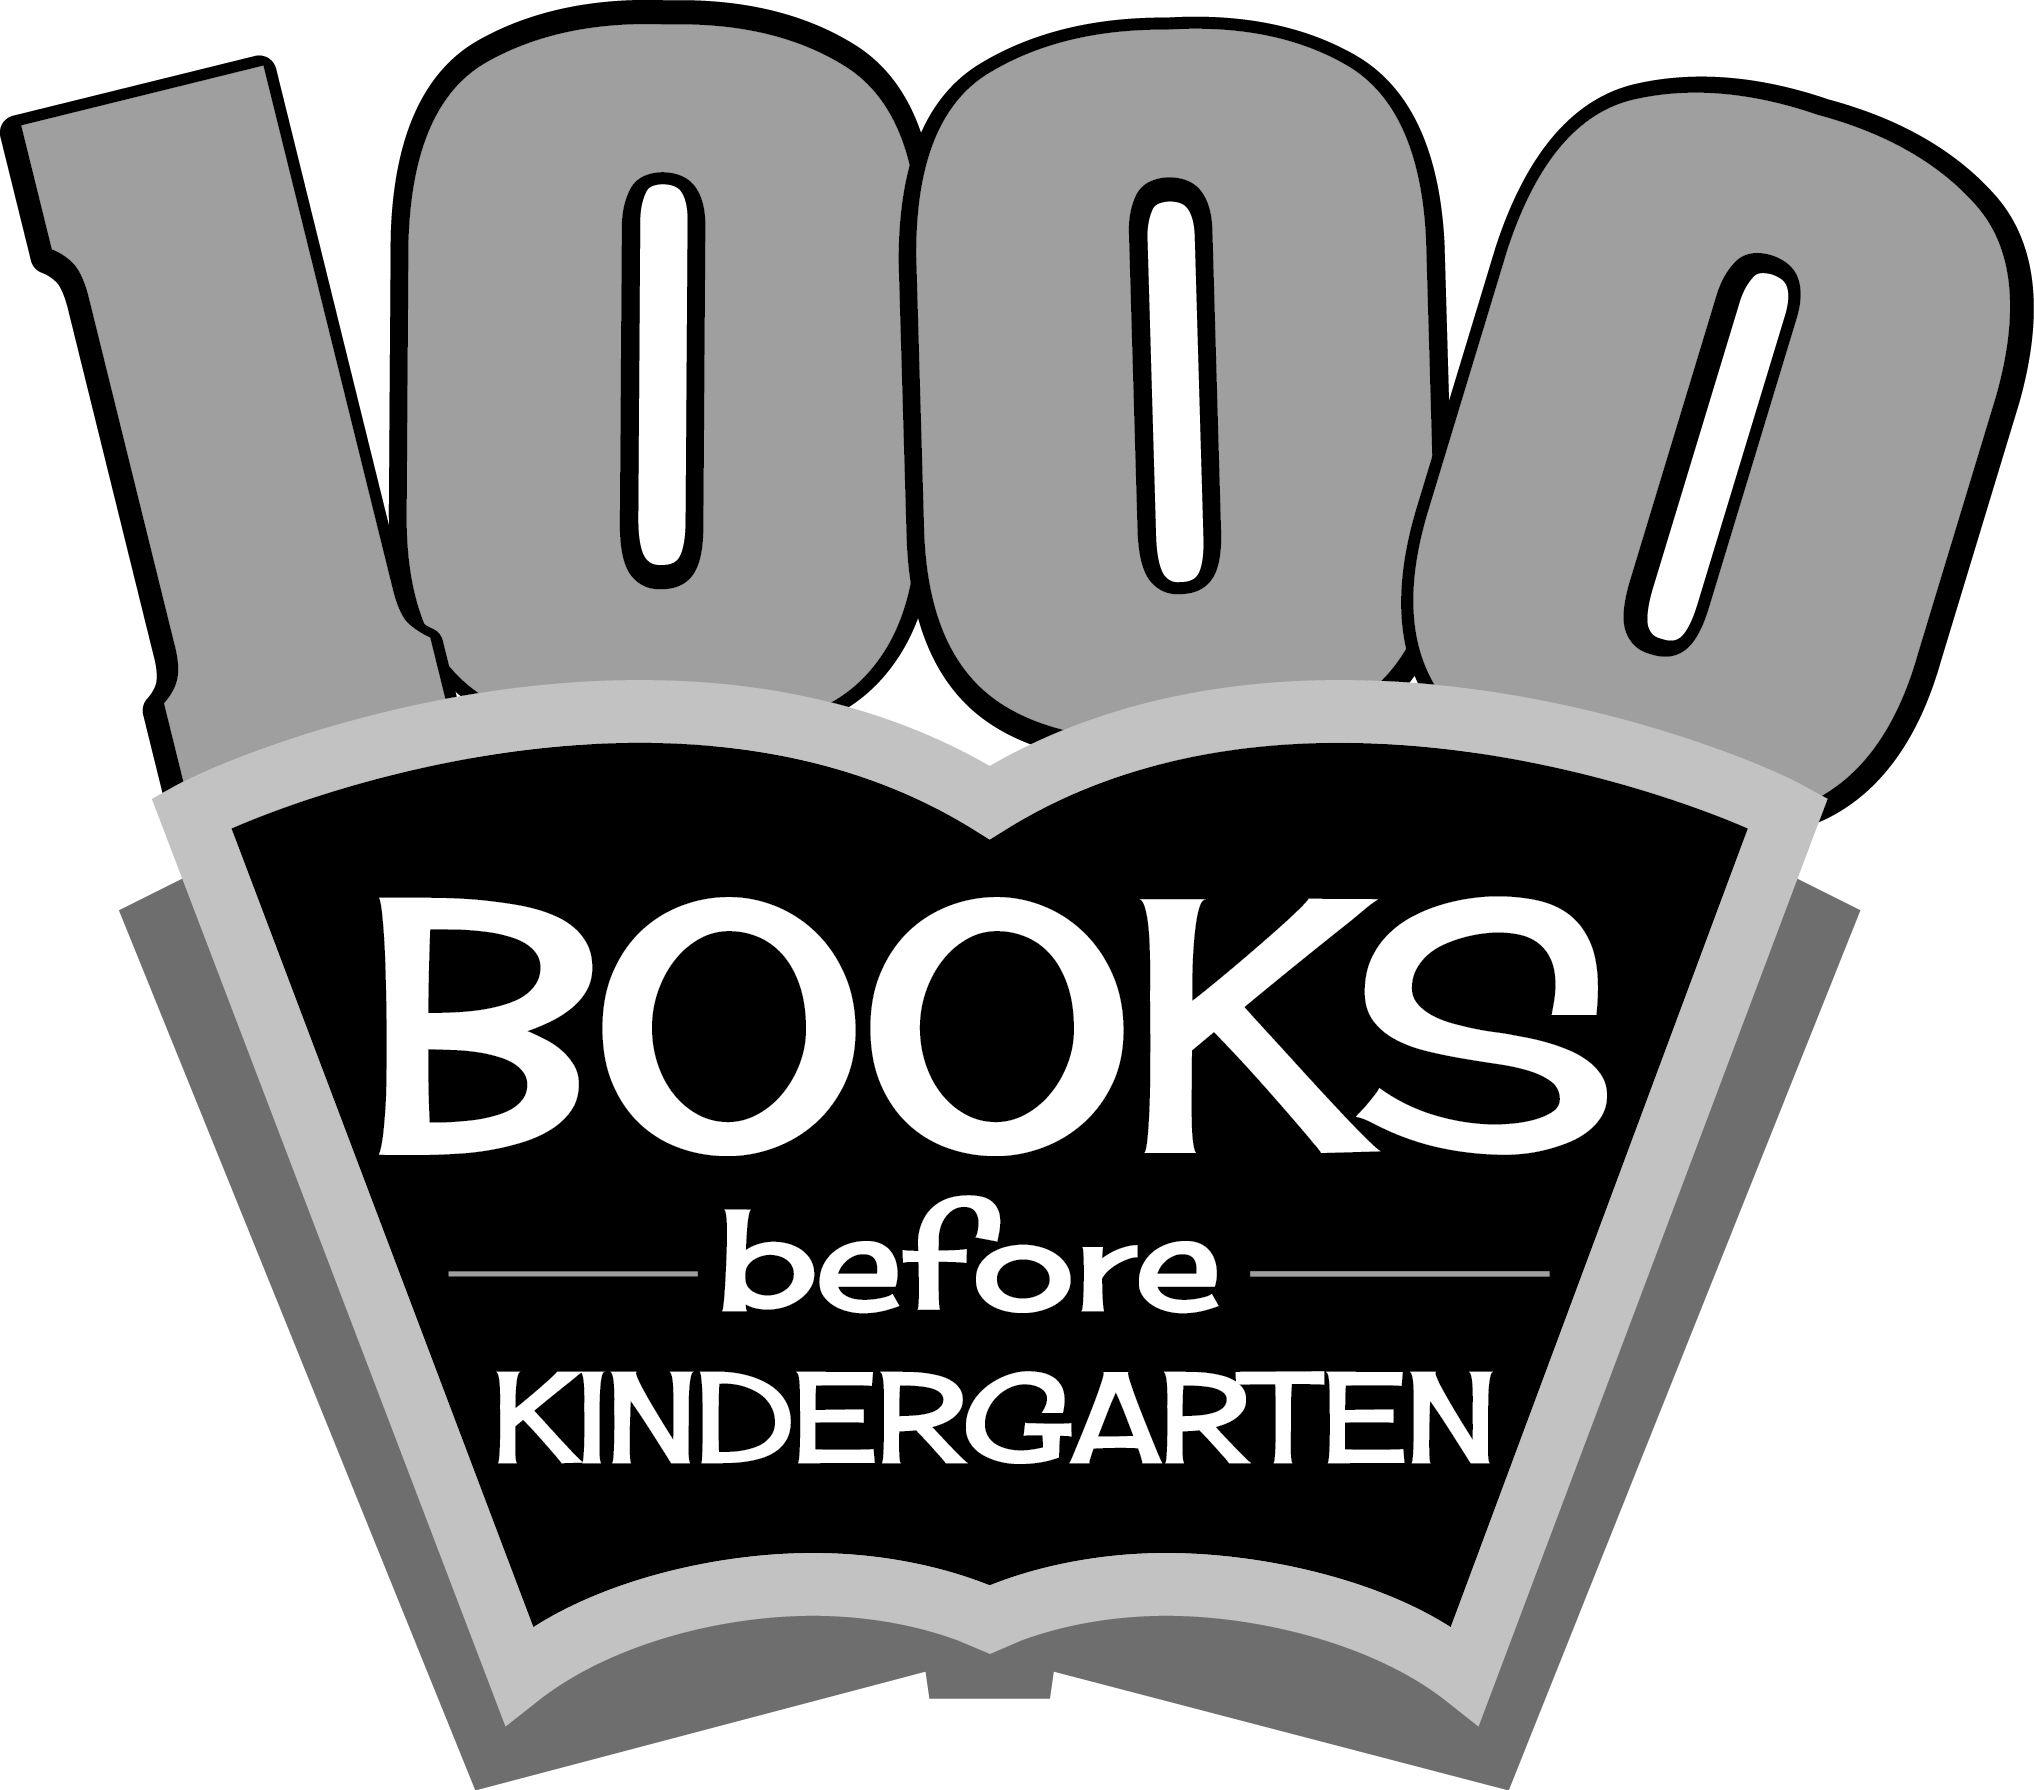 1000 books before kindergarten bw jpg image materials